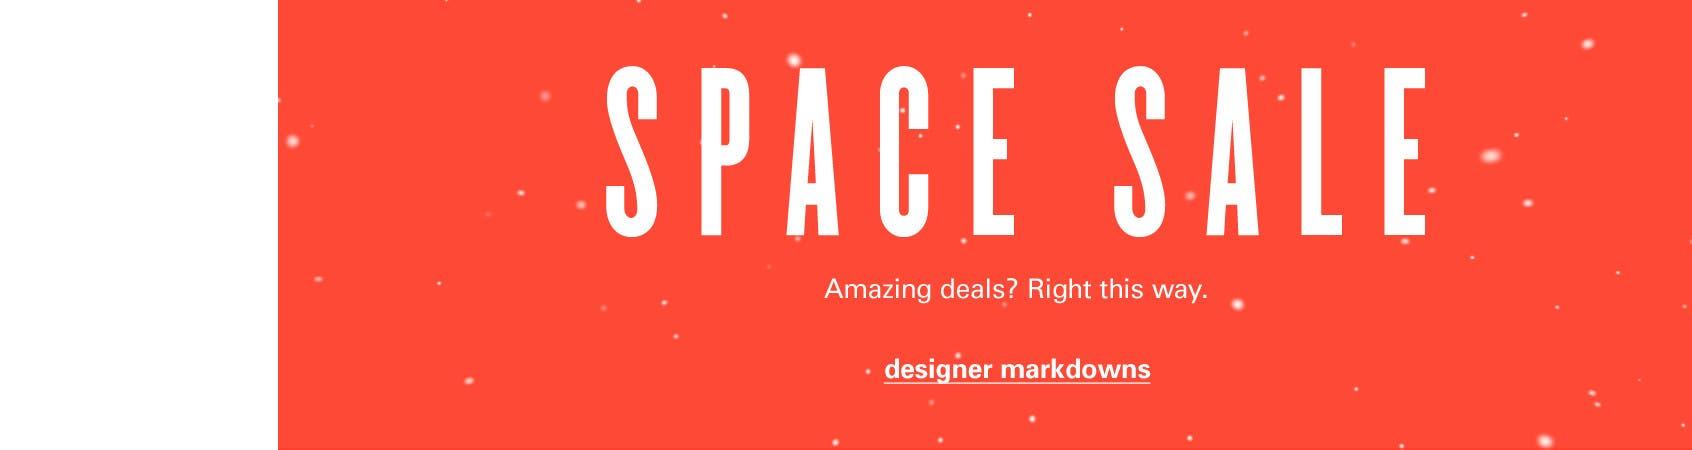 SPACE sale: designer markdowns.